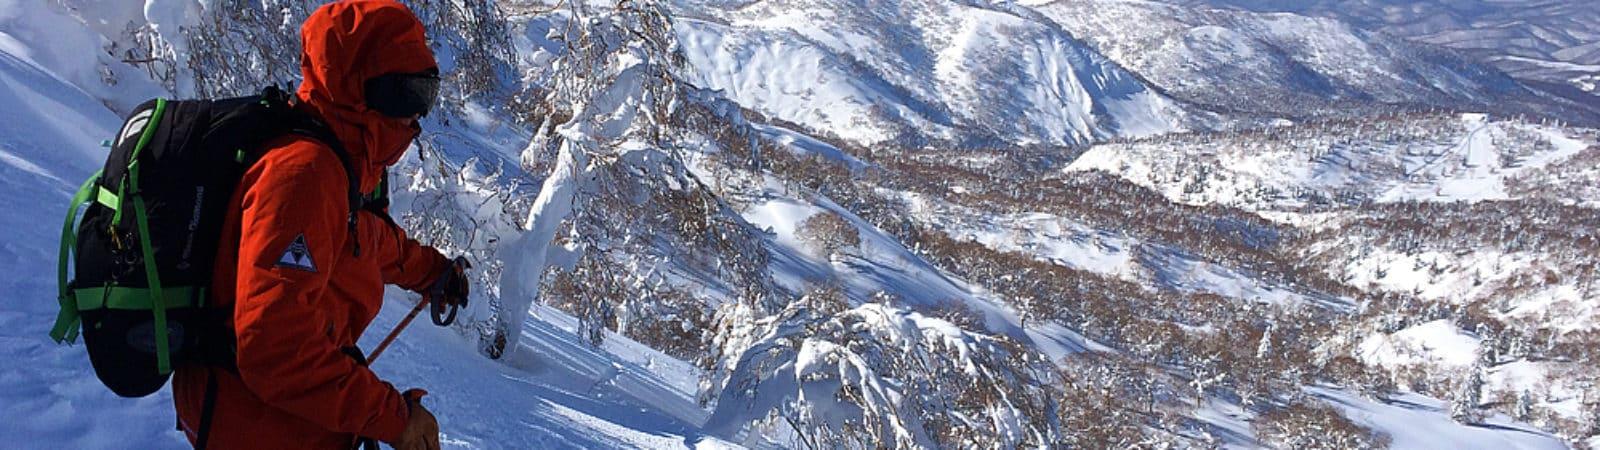 Freeride skiing and ski touring in Niseko